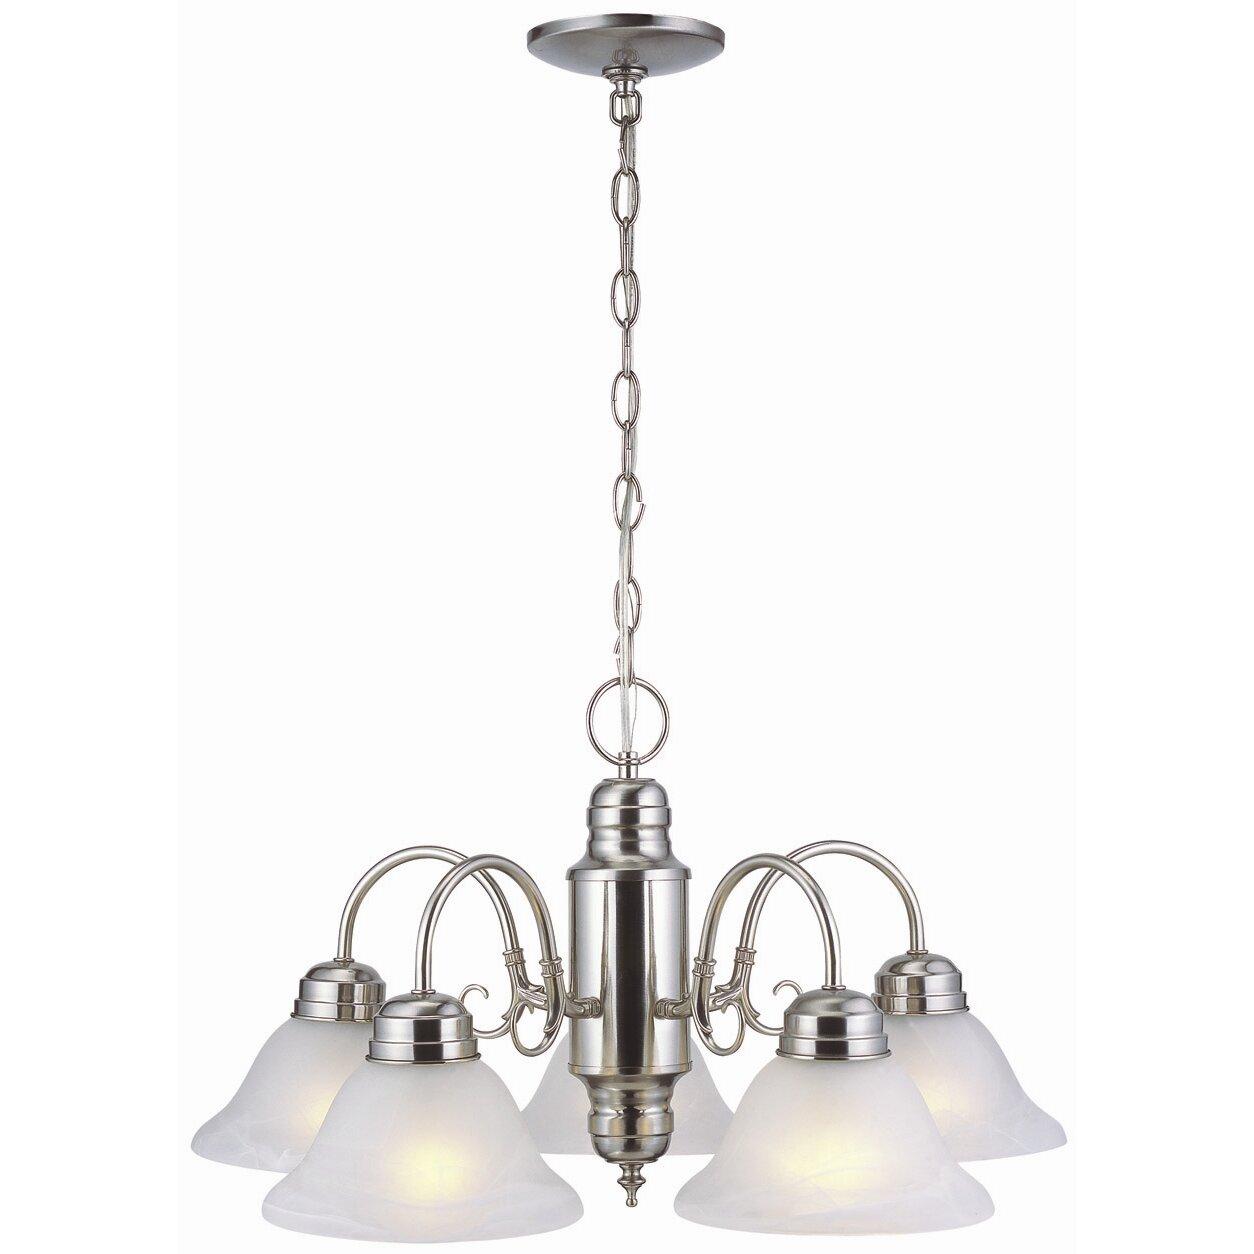 Ikuzo Lighting: Millbridge 5 Light Chandelier